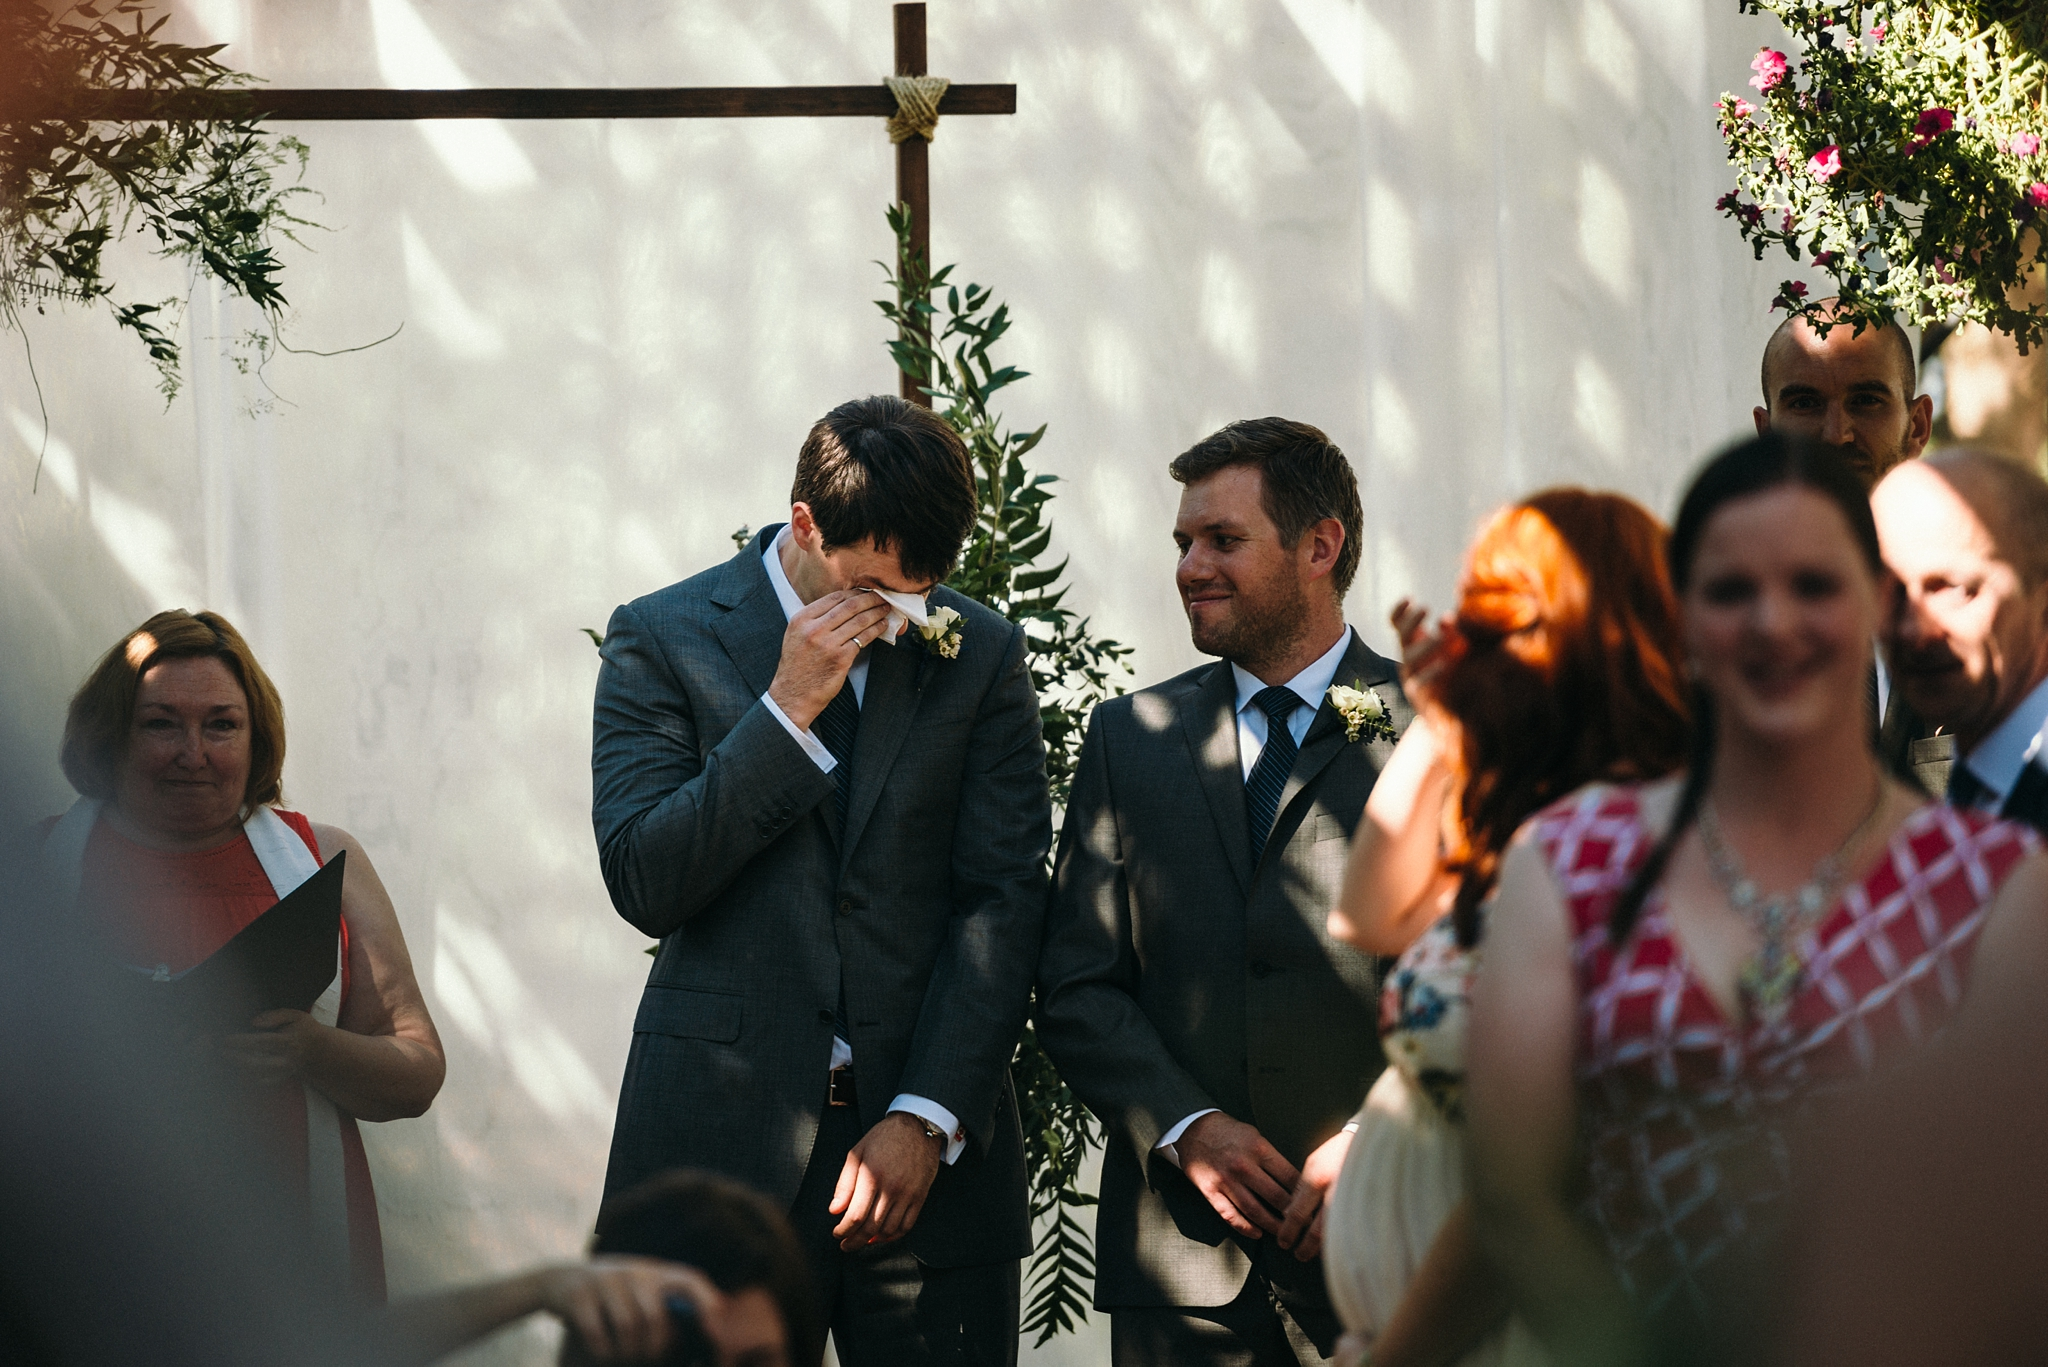 kaihla_tonai_intimate_wedding_elopement_photographer_4351